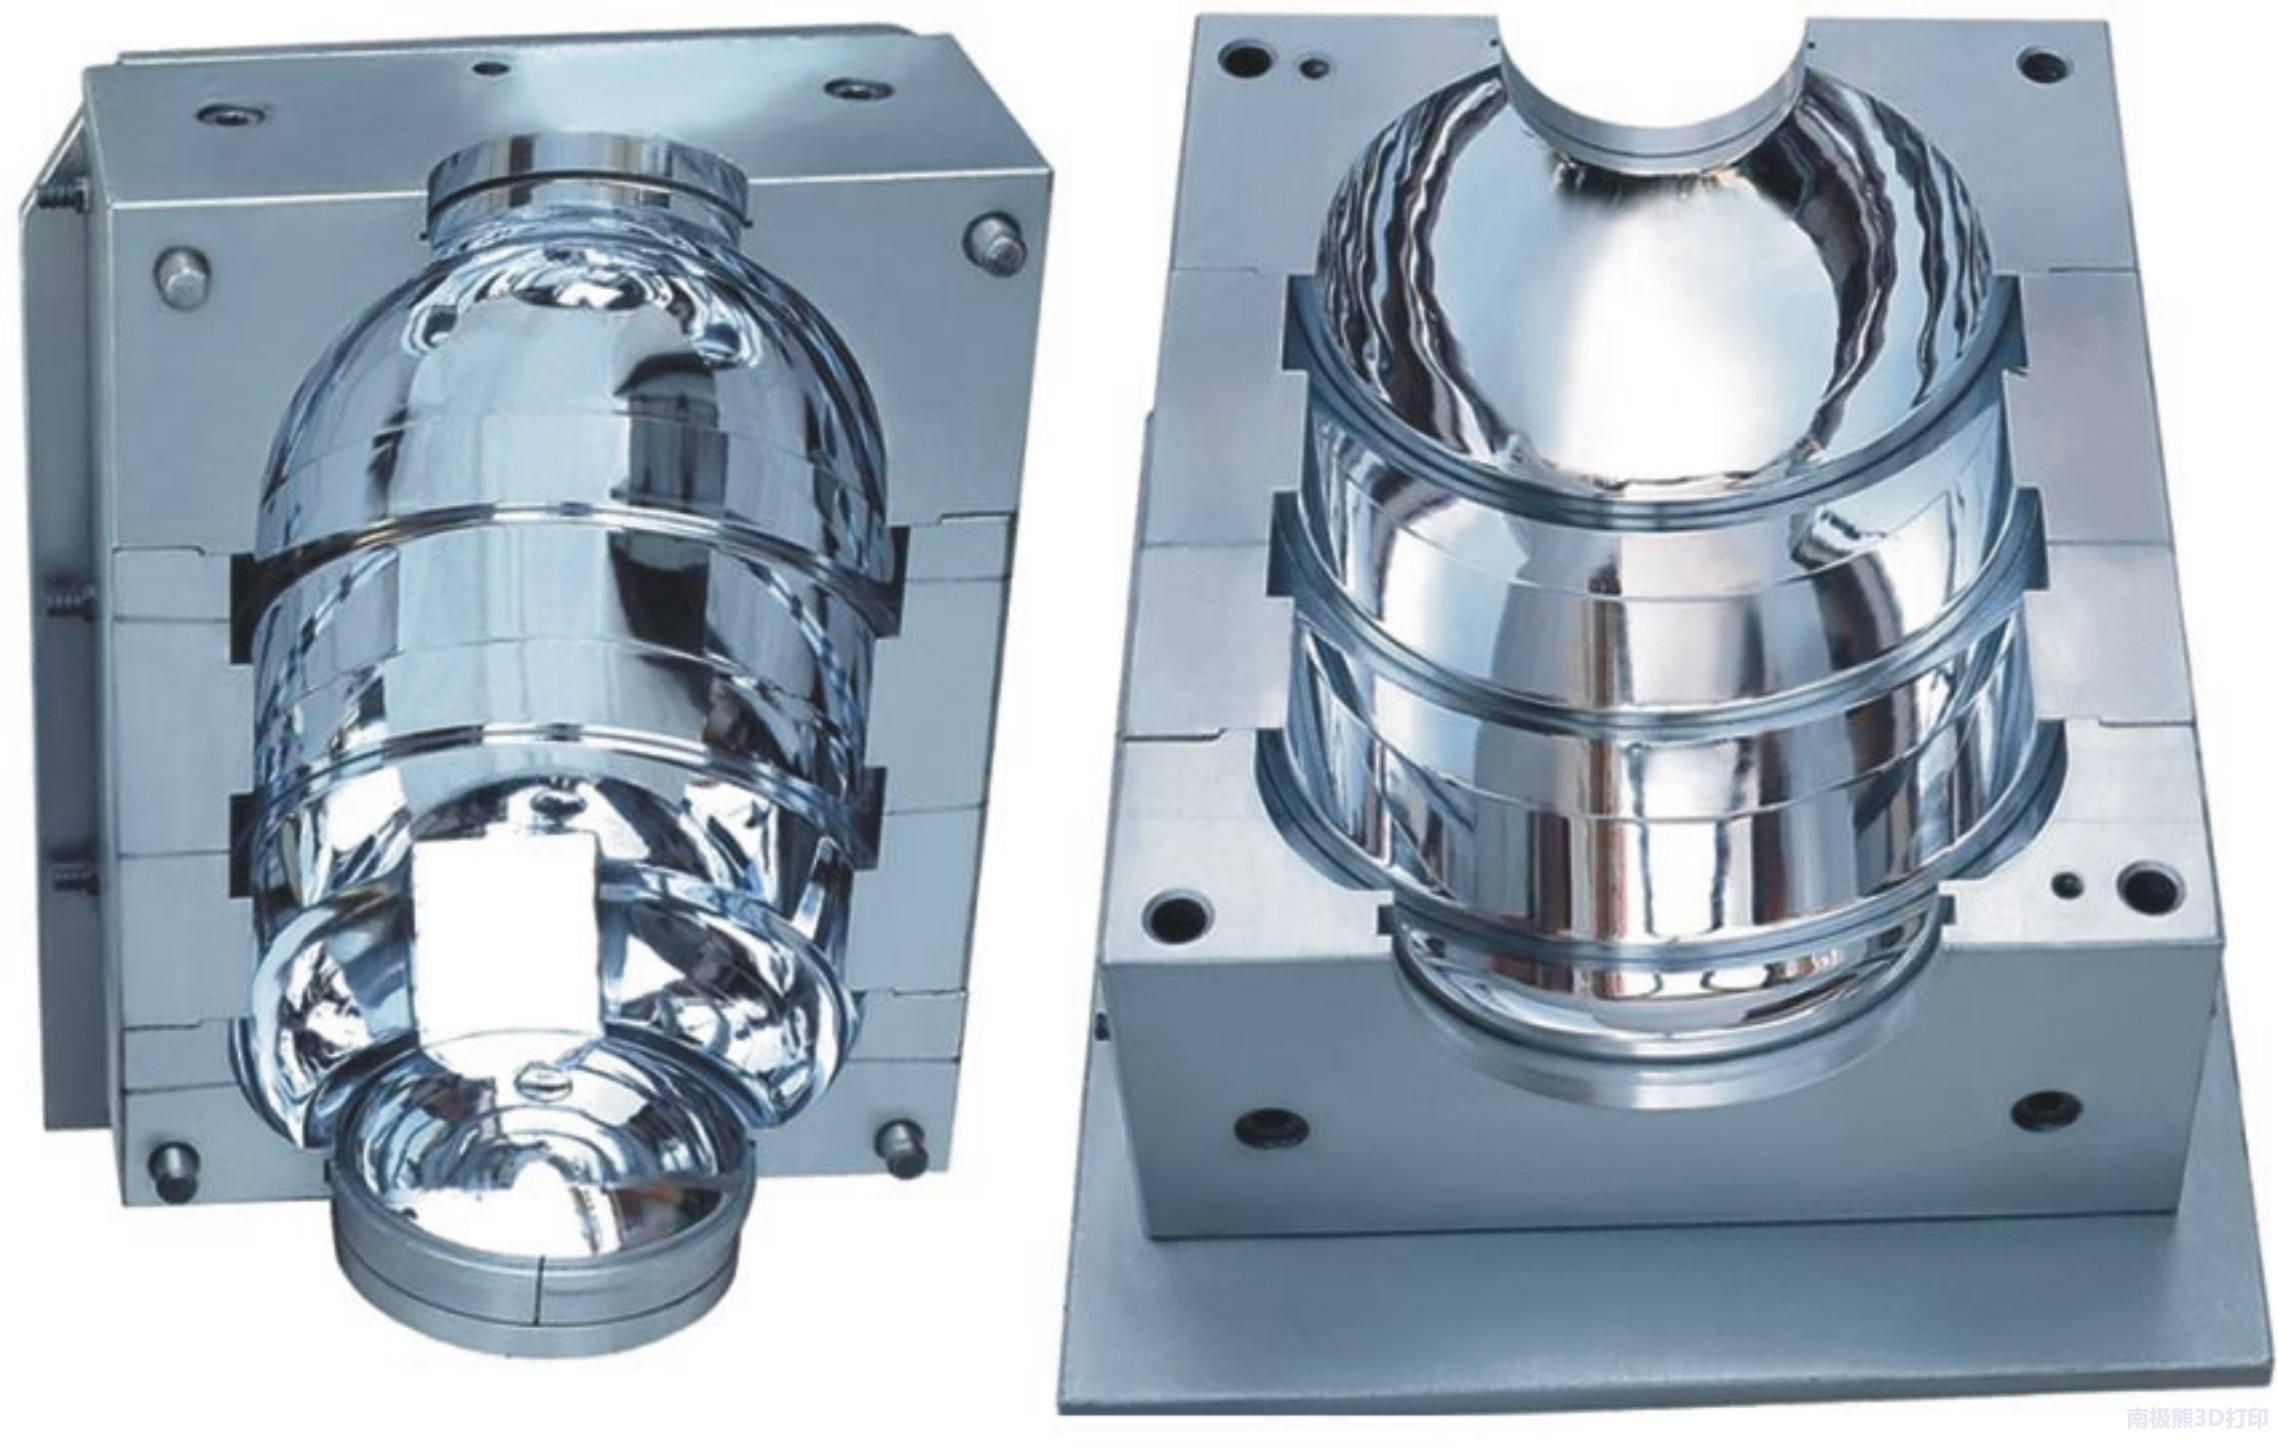 3D打印在模具制造行业的应用